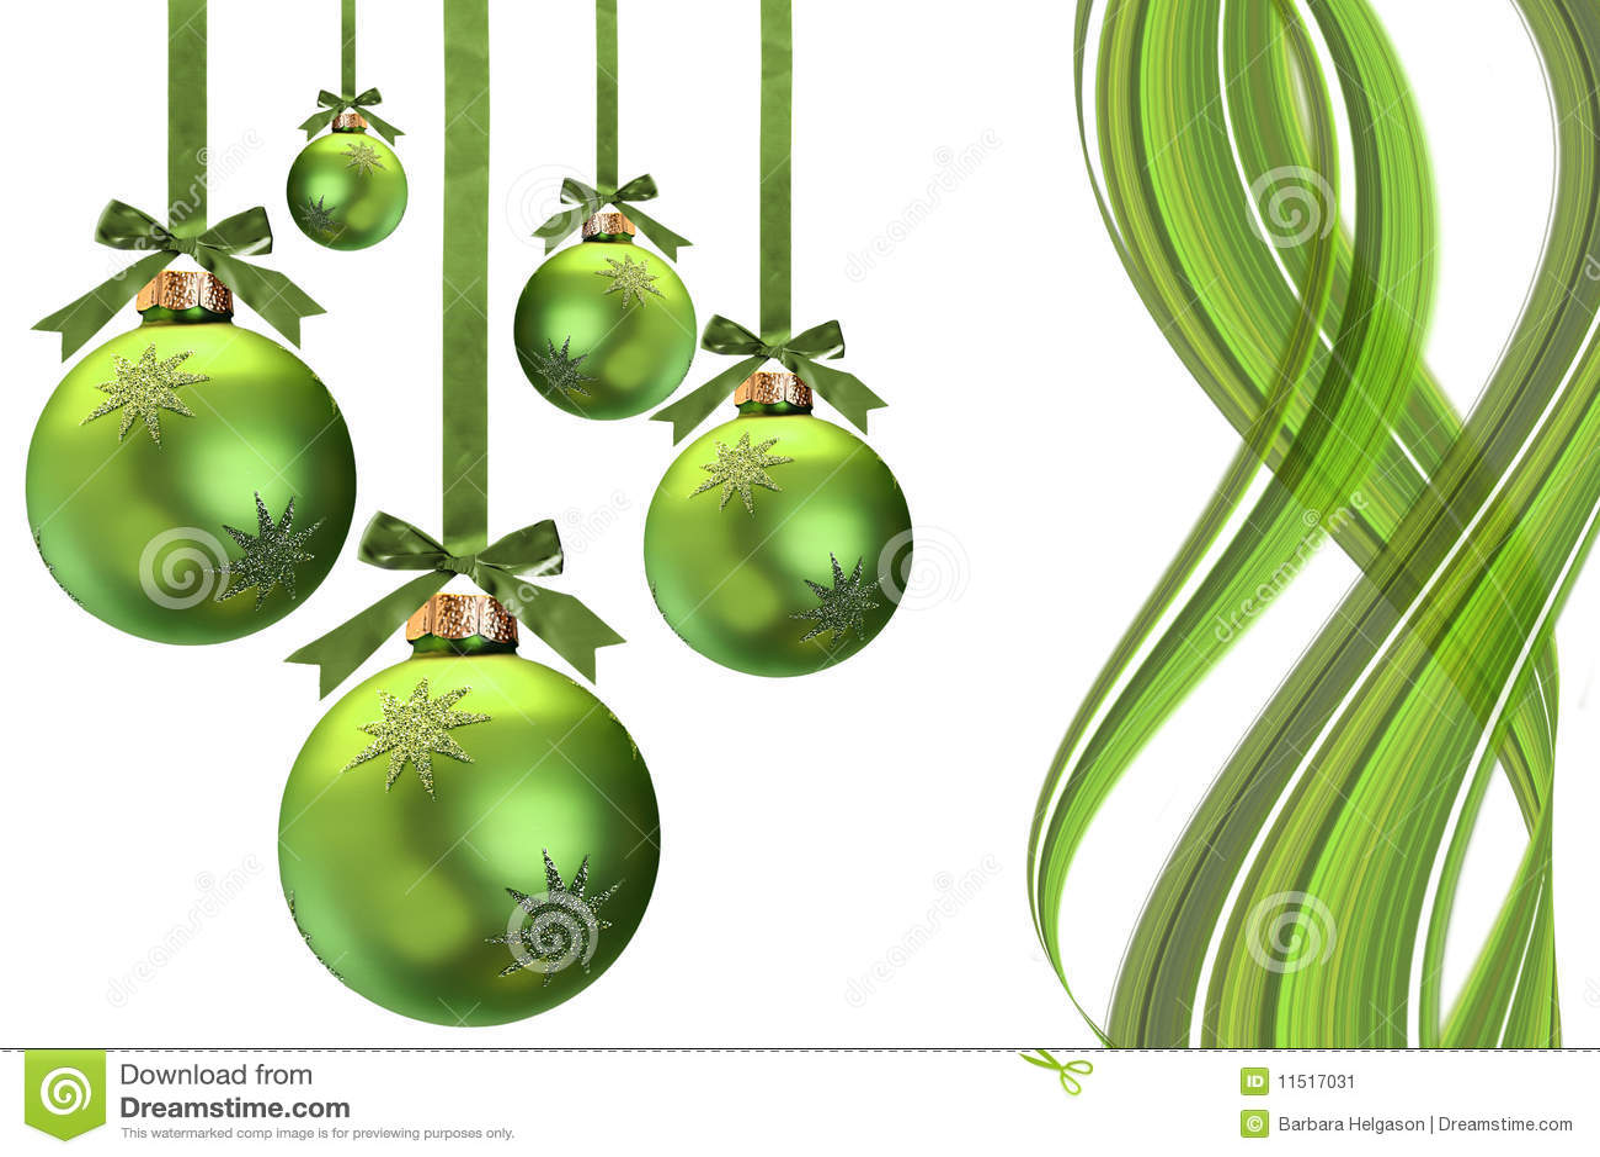 #8CB219 Noël Vert Image Stock Image: 11517031 6115 decoration de noel verte 1300x957 px @ aertt.com